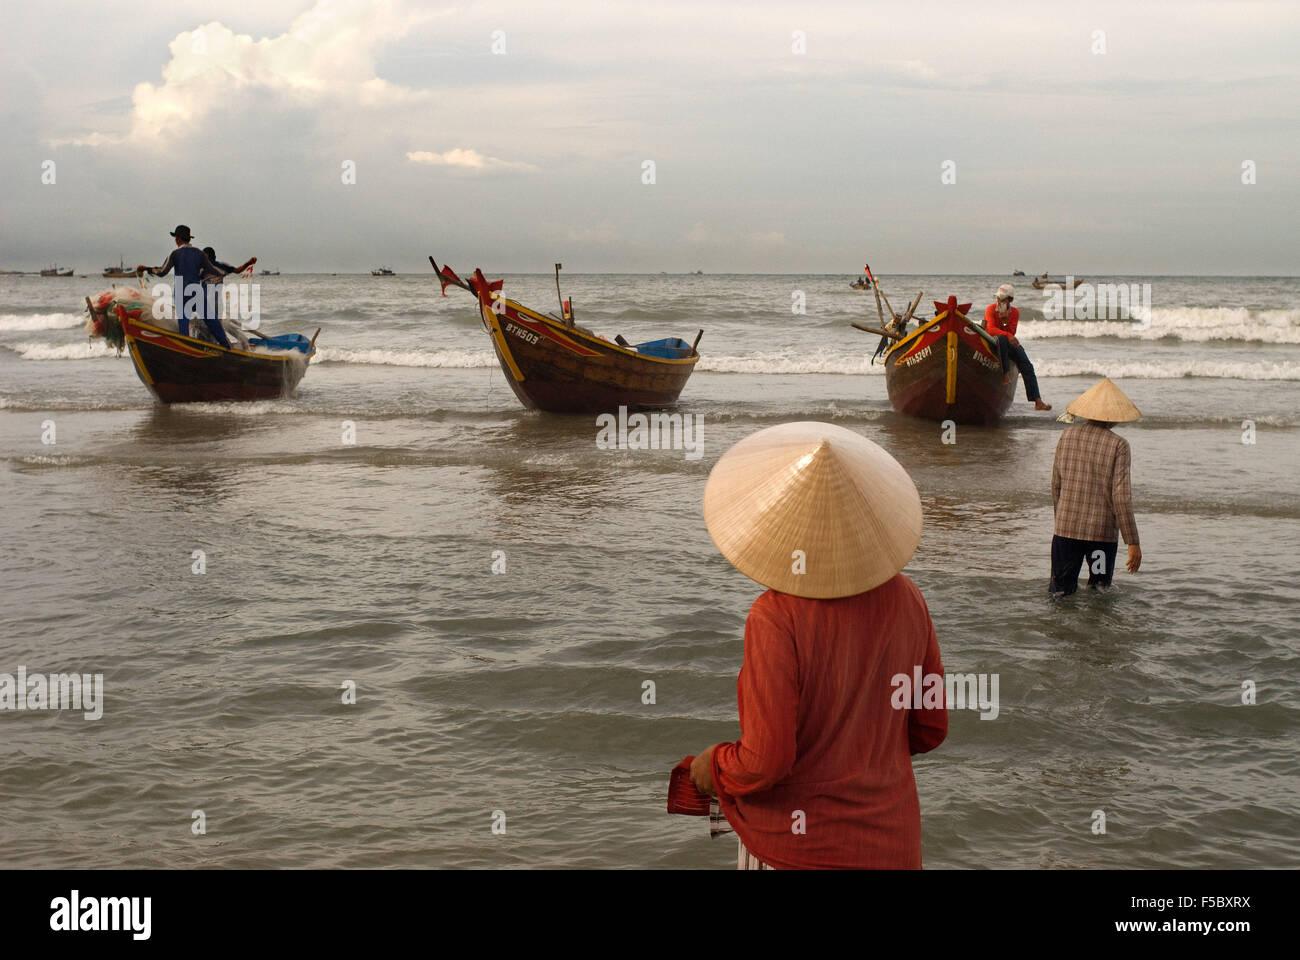 Lady awaiting the landing of the catch, Mui Ne fishing village, Bình Thuận Province, Vietnam - Stock Image